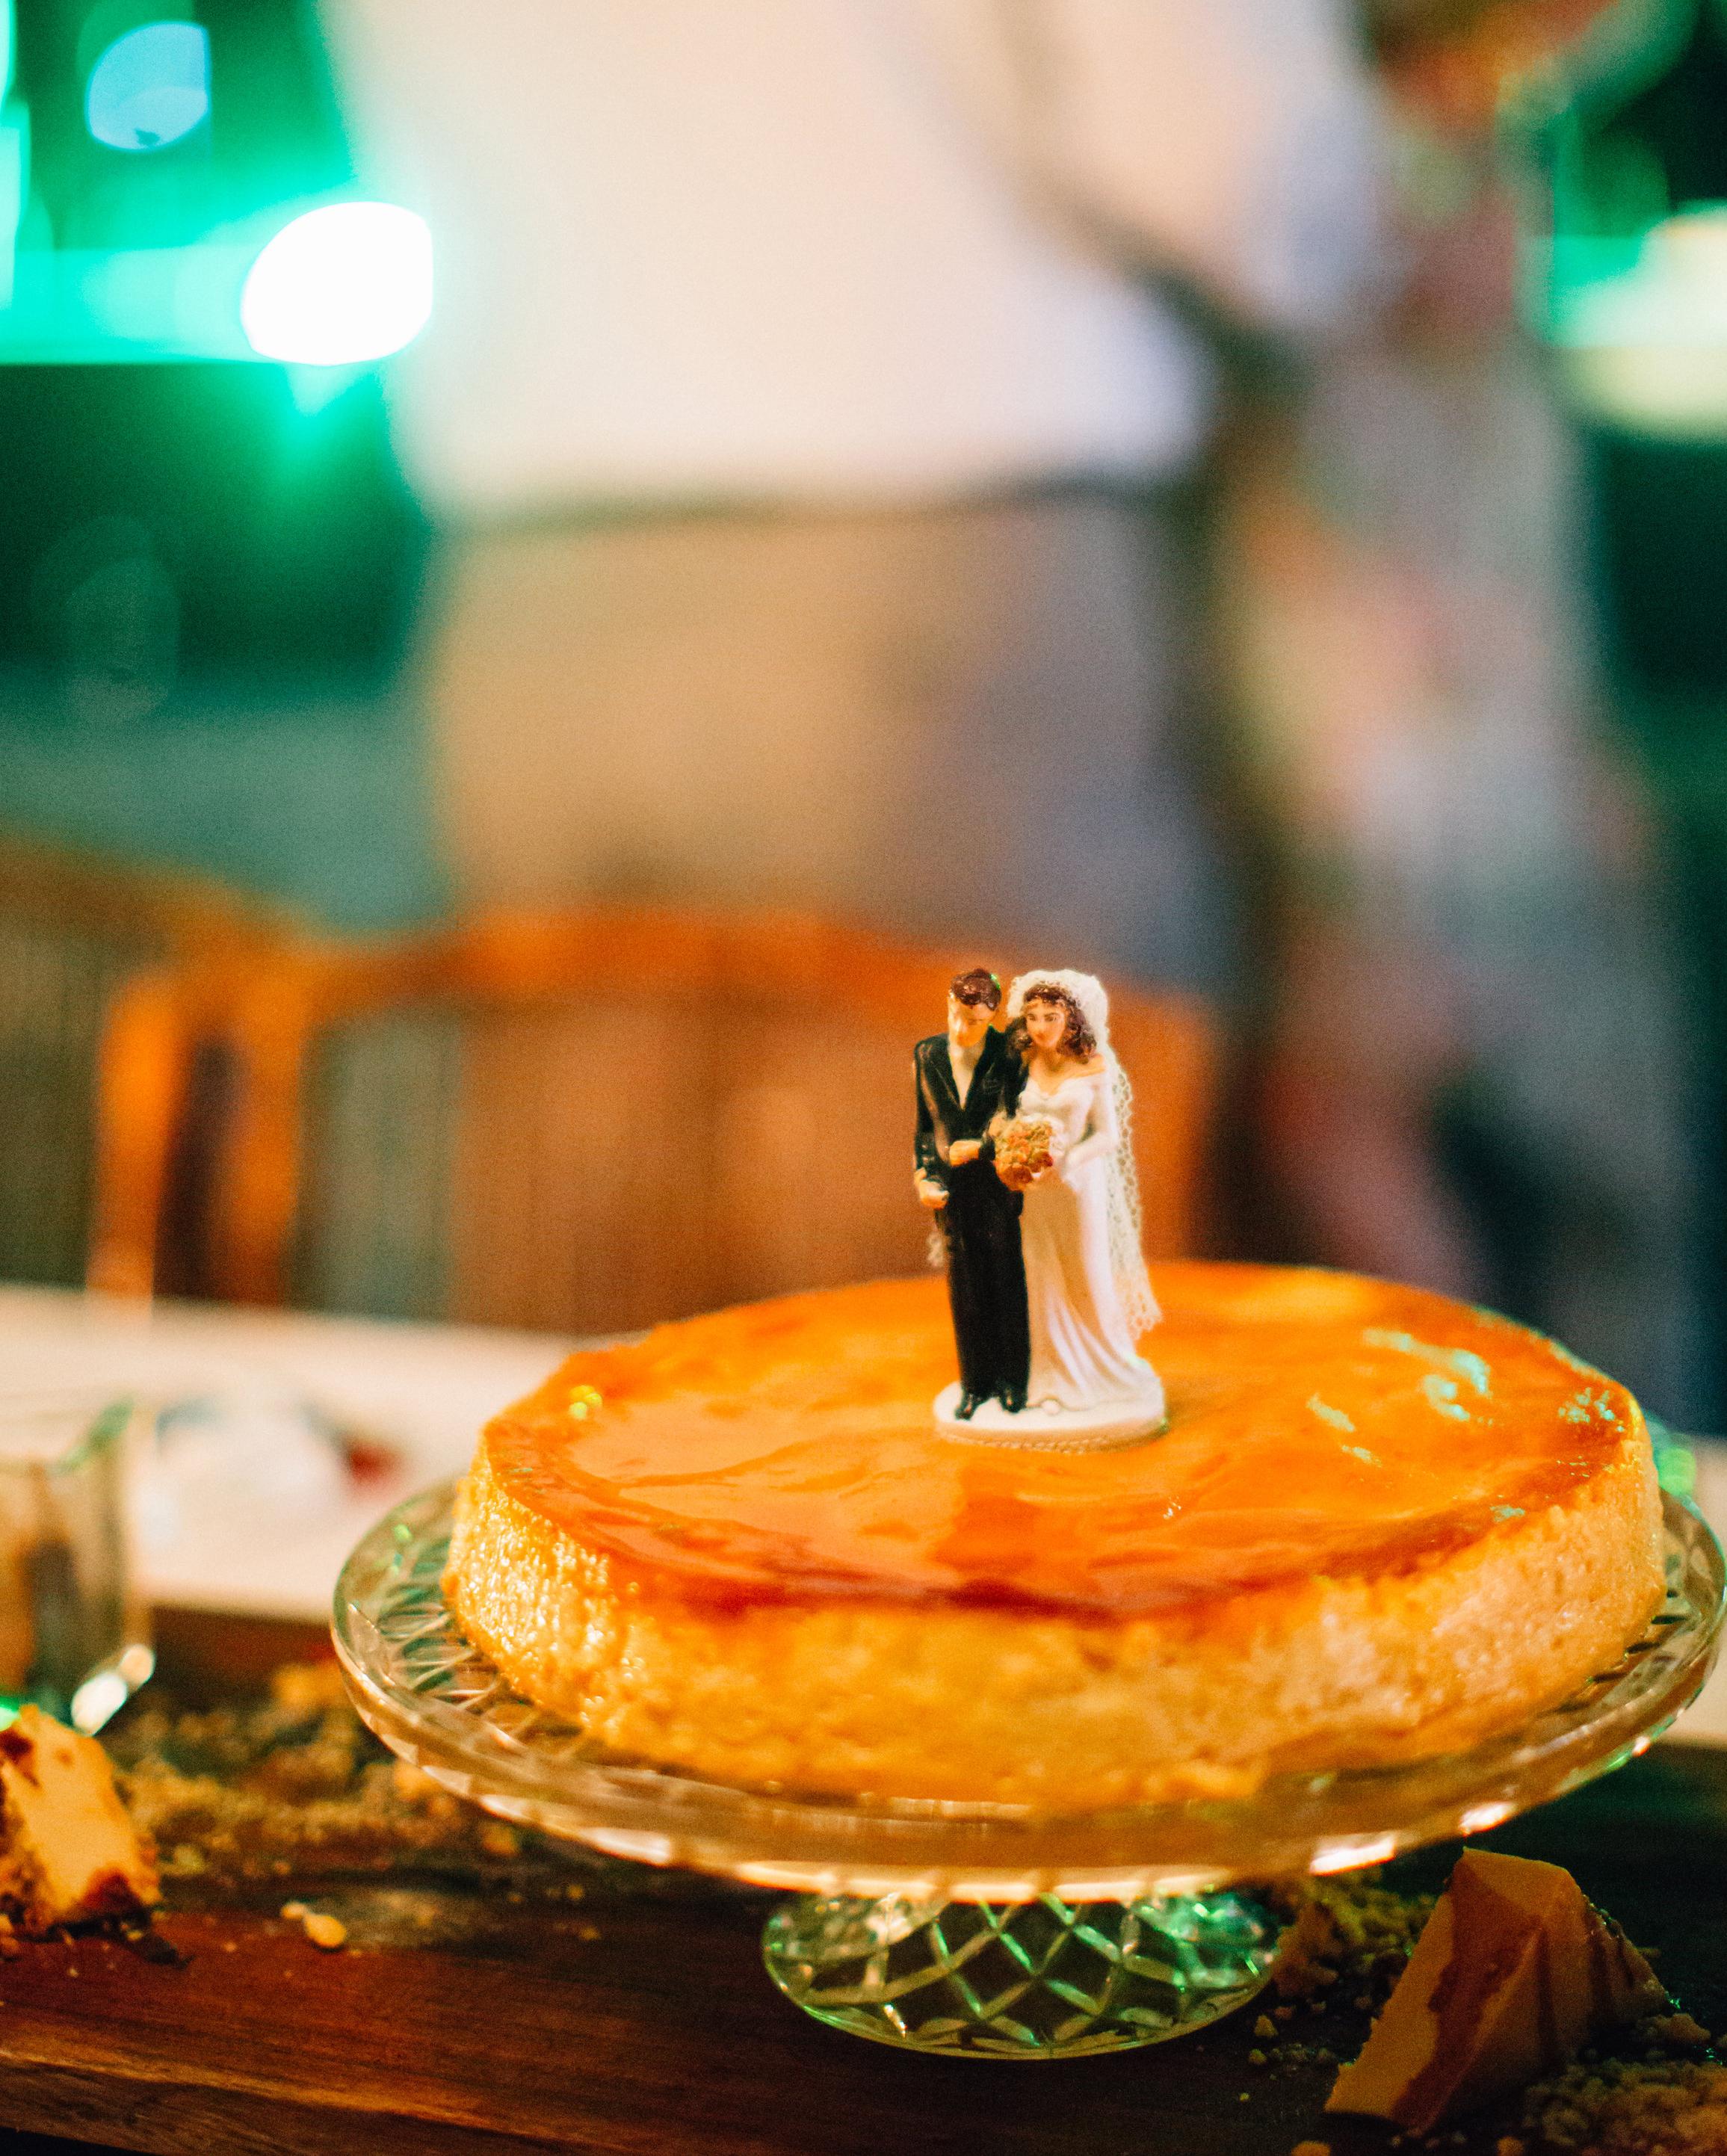 olivia-keith-wedding-cake-157-s112304-0815.jpg